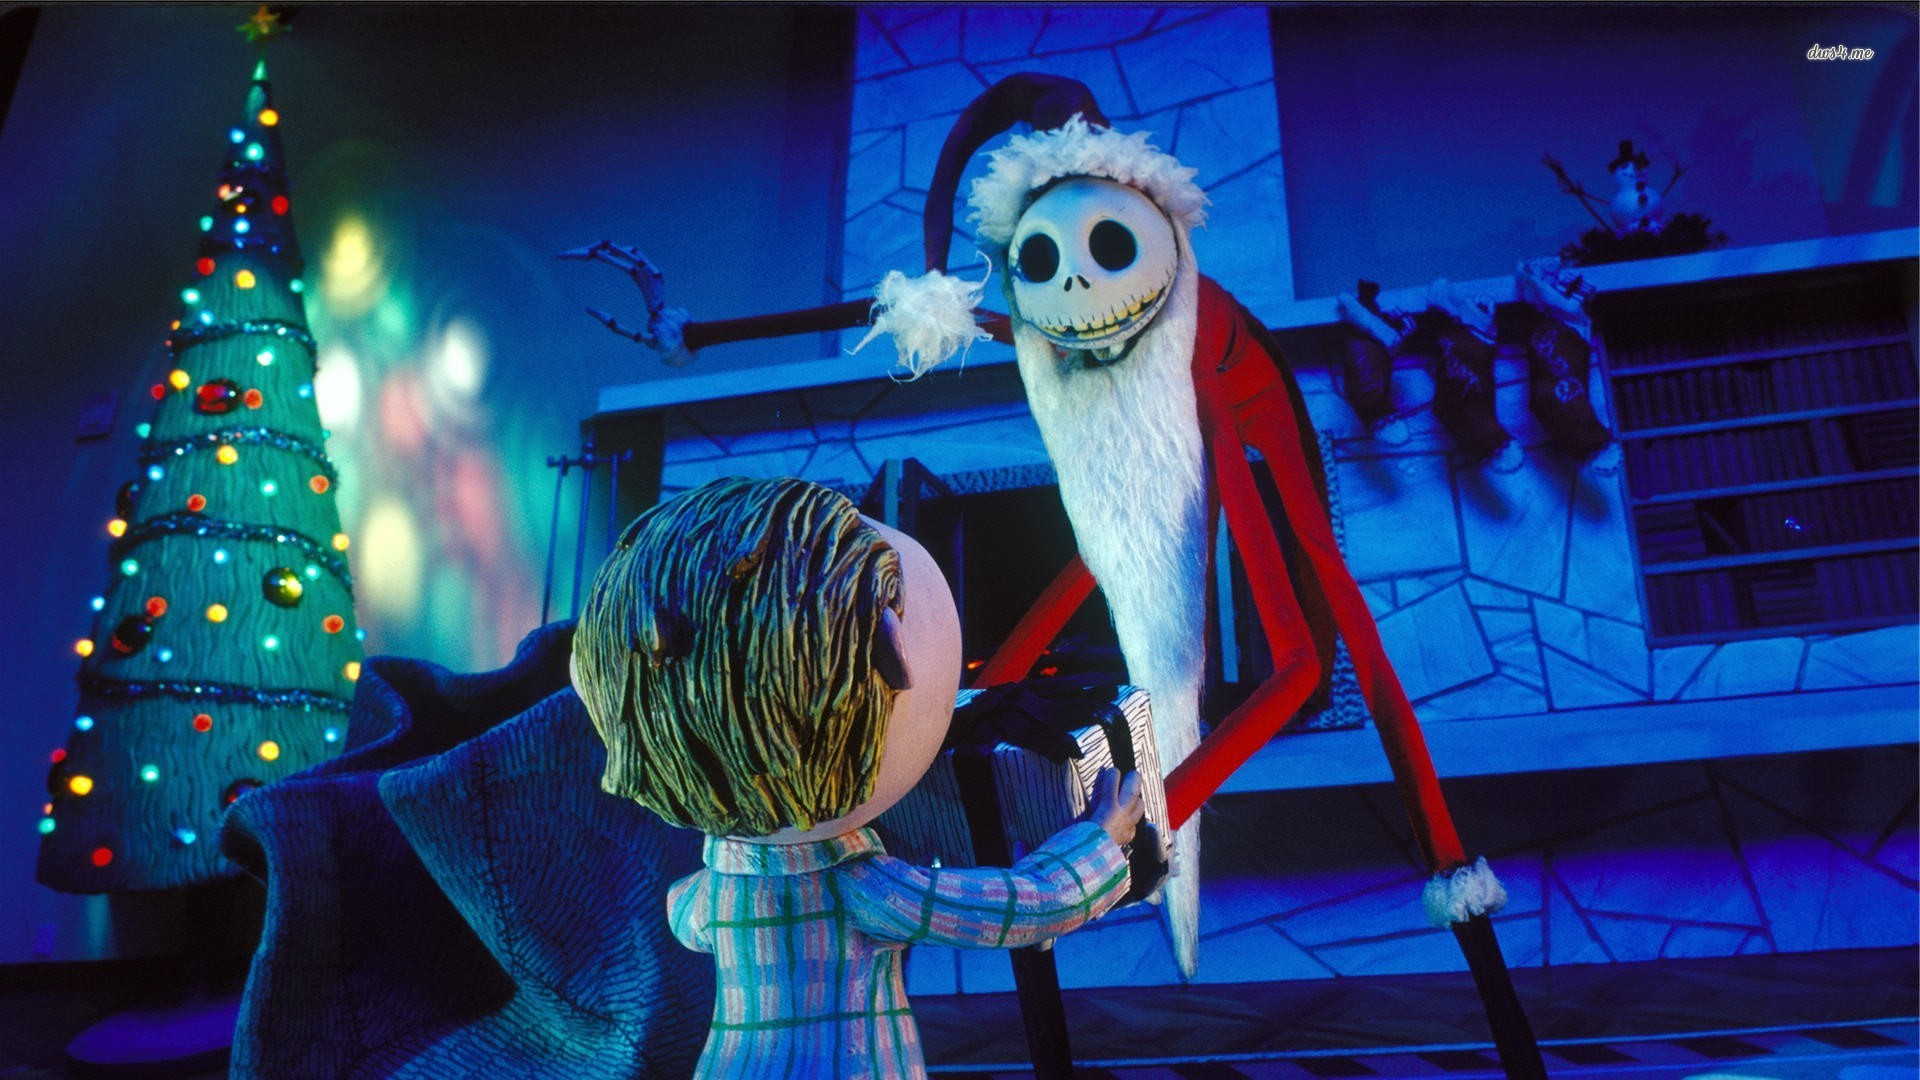 Nightmare Before Christmas Wallpaper, The Nightmare Before Christmas ...